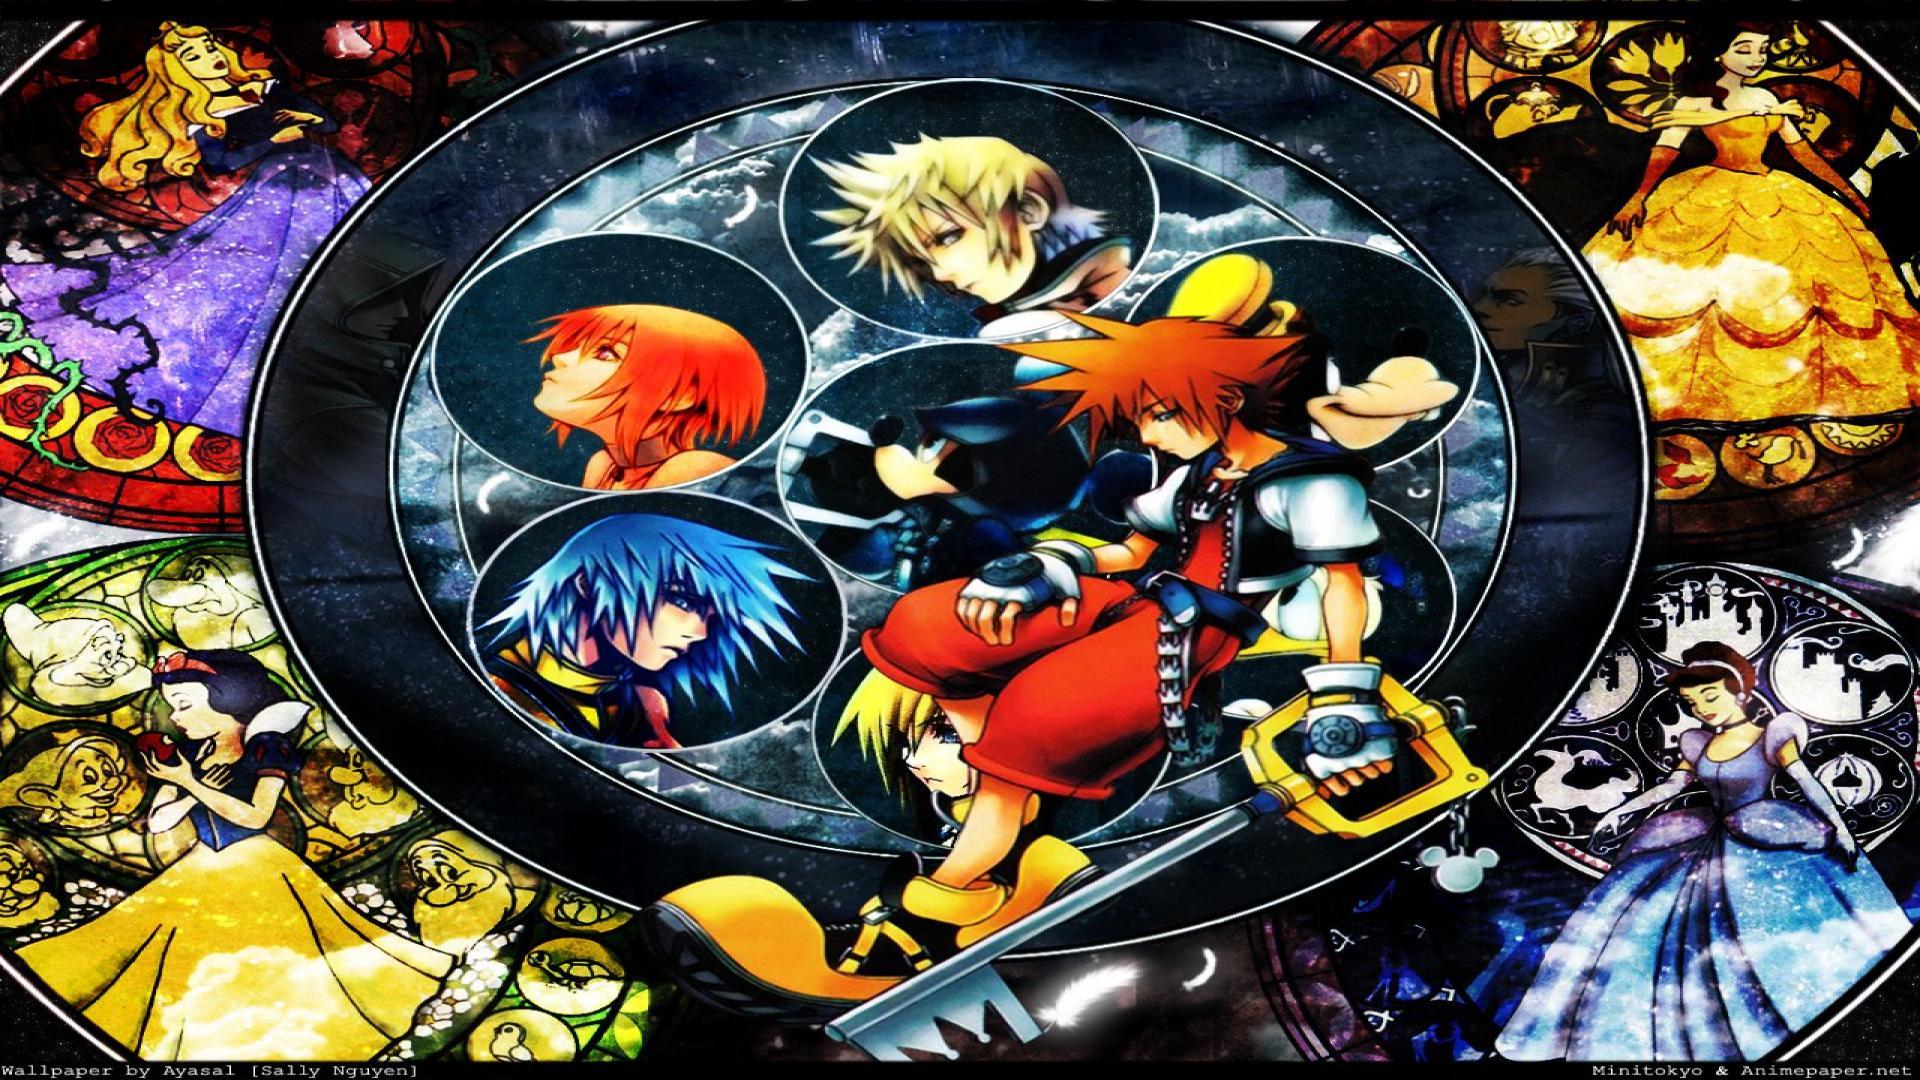 Kingdom Hearts Wallpaper 1920x1080 - HD Wallpaper